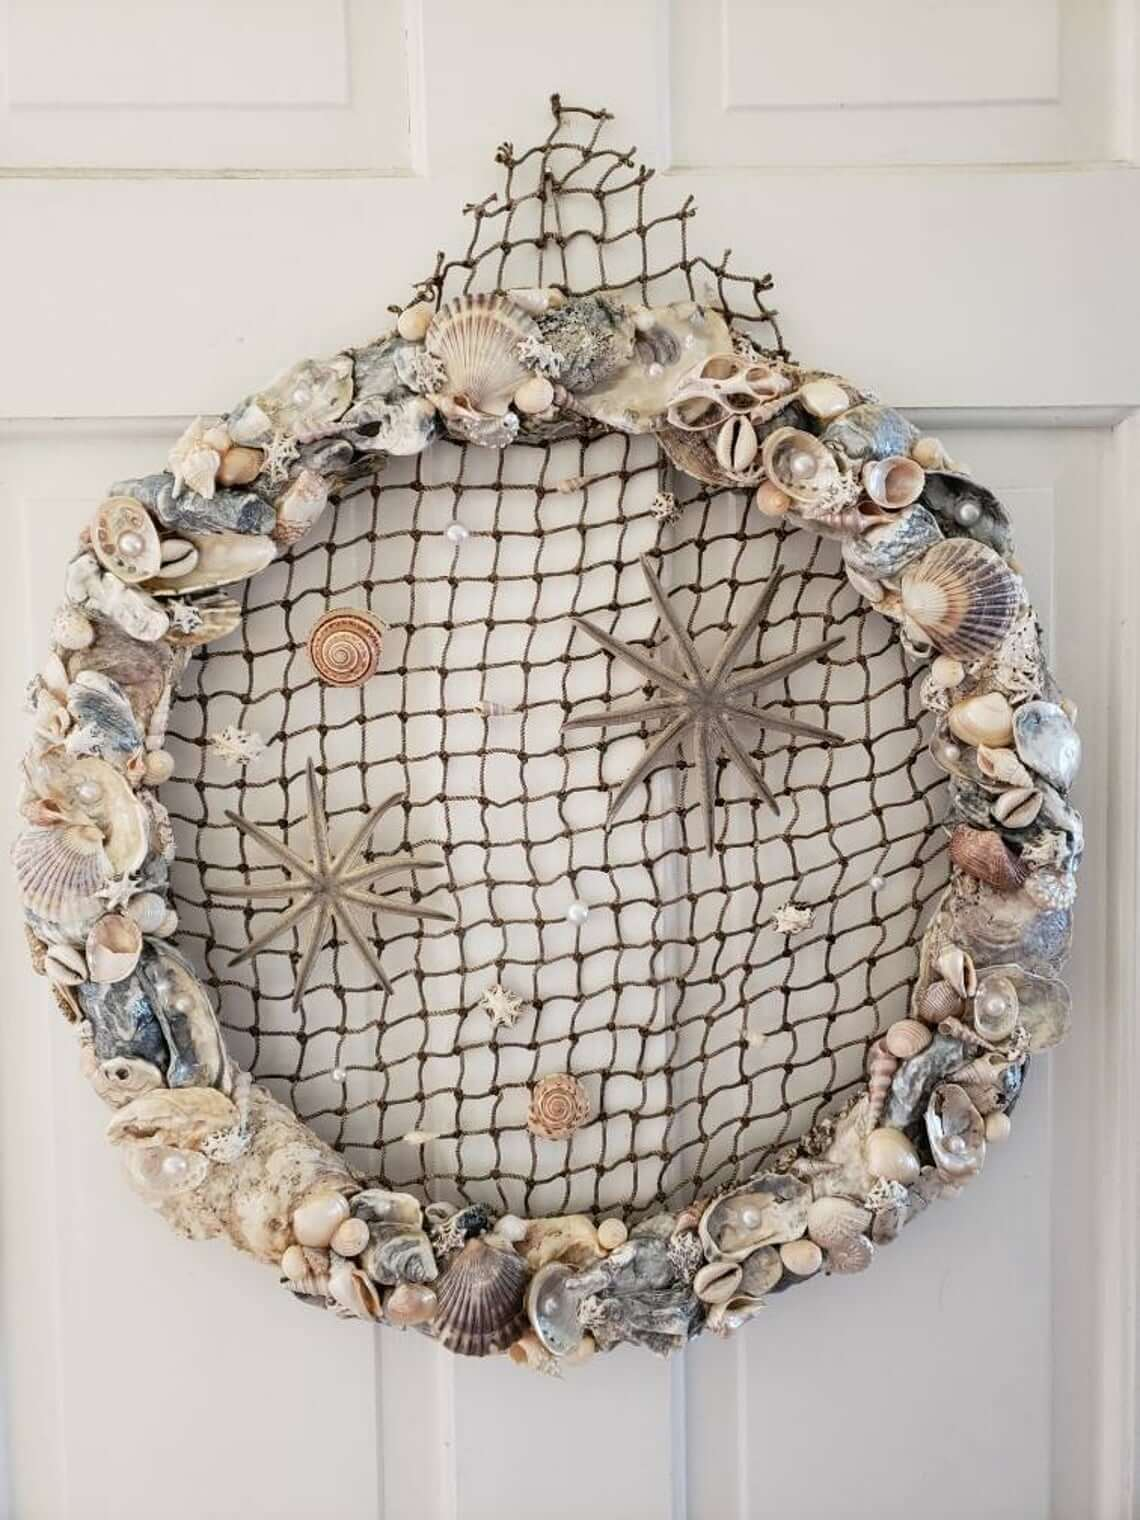 Nautical Net and Sea Critters DIY Wreath